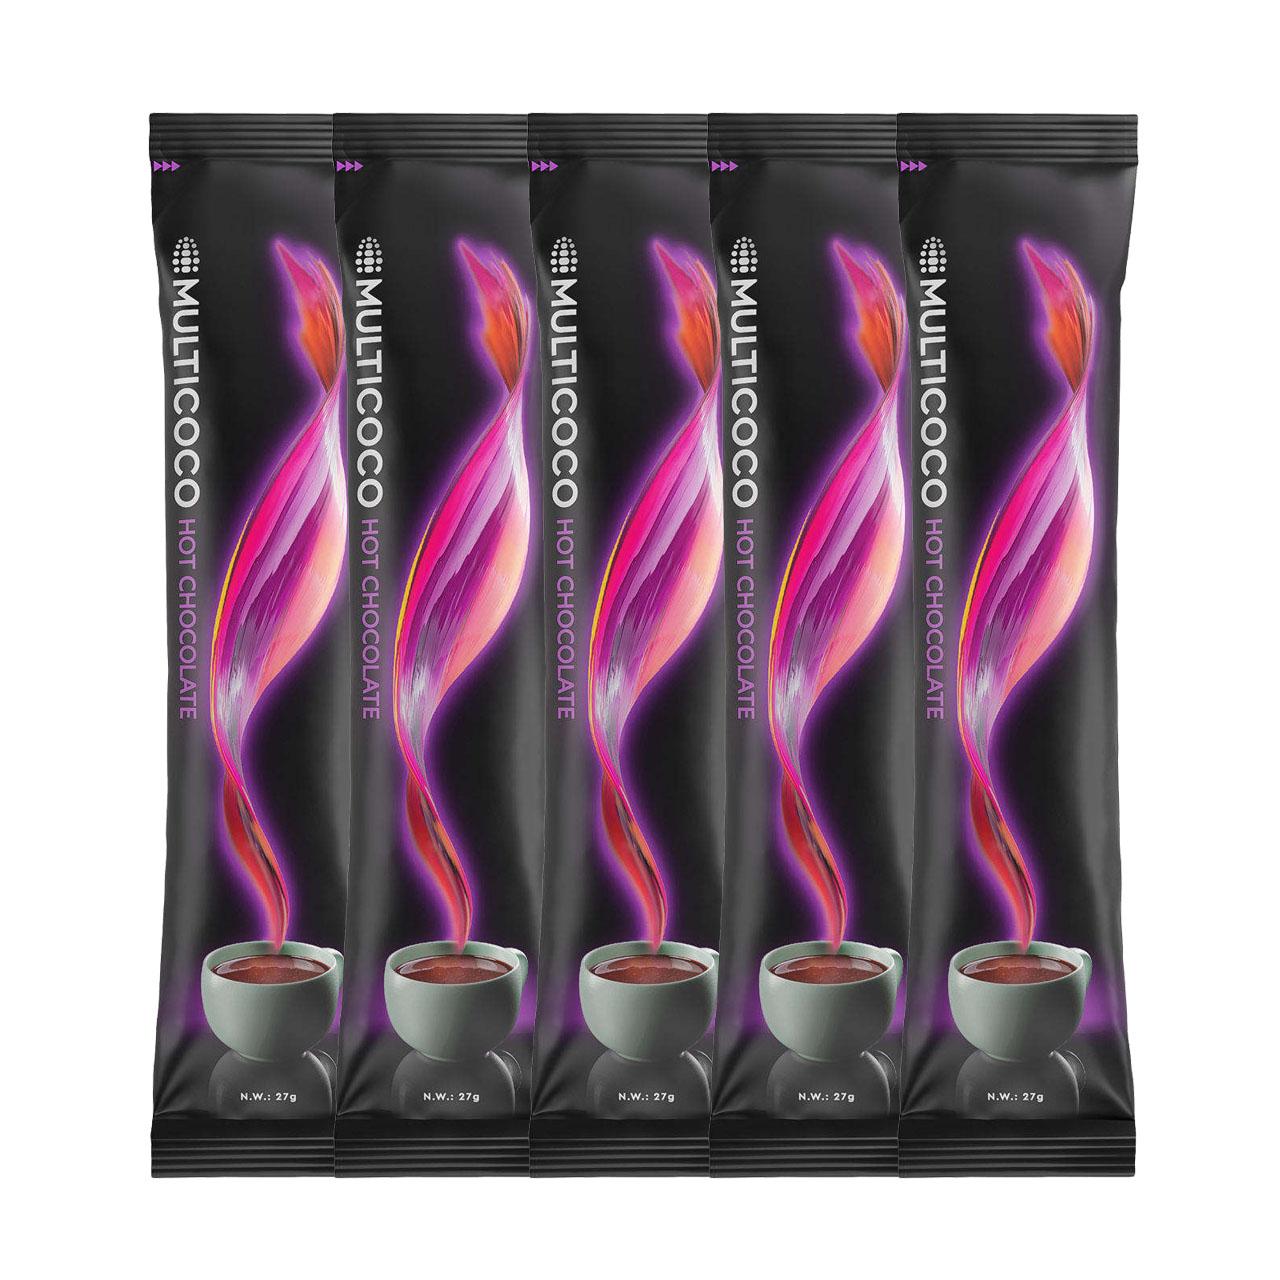 هات چاکلت مولتی کوکو - 27 گرم بسته 5 عددی